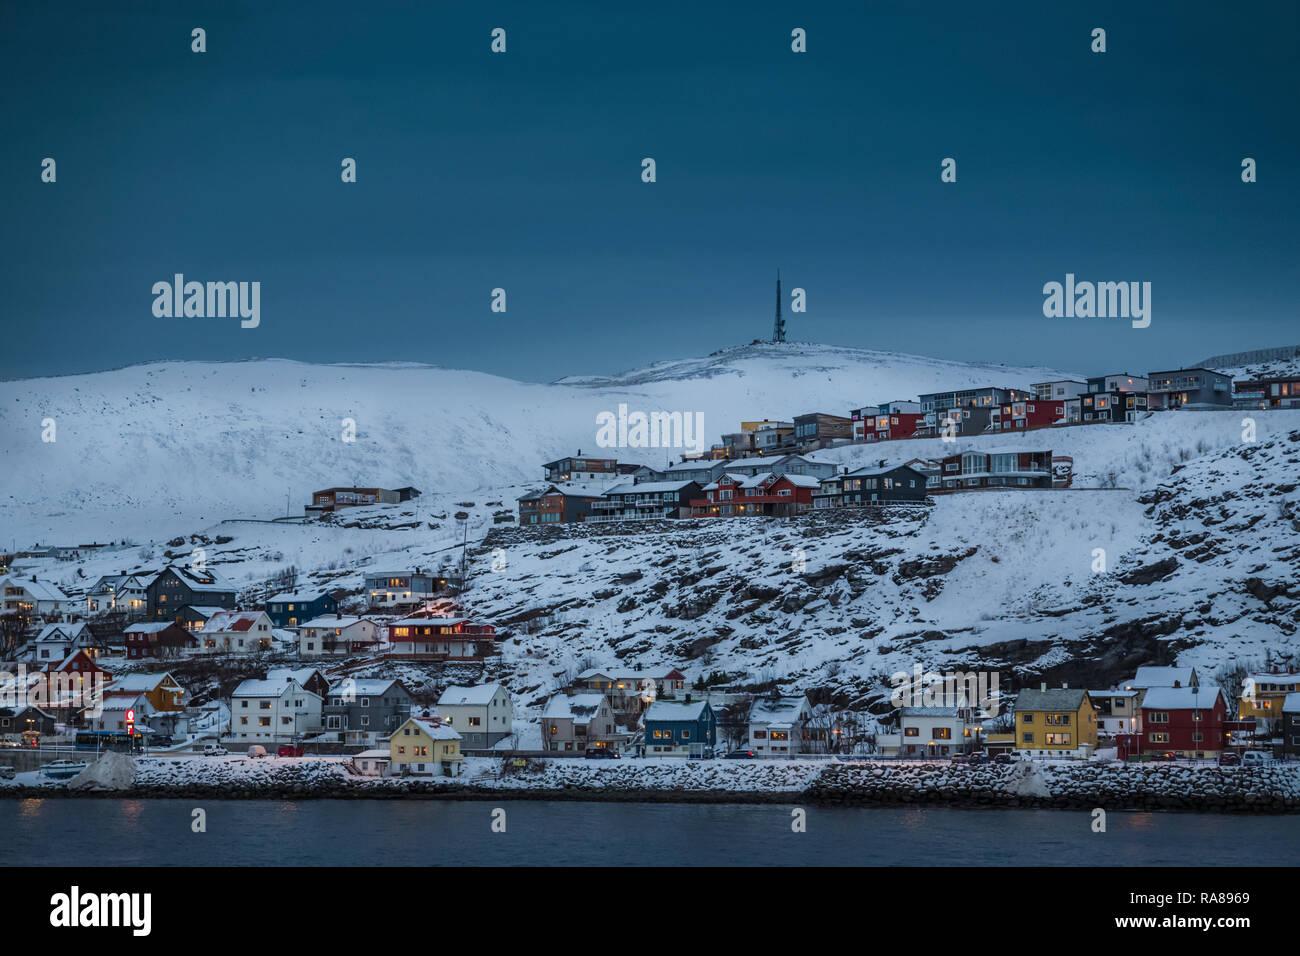 Hammerfest, Norway. Stock Photo